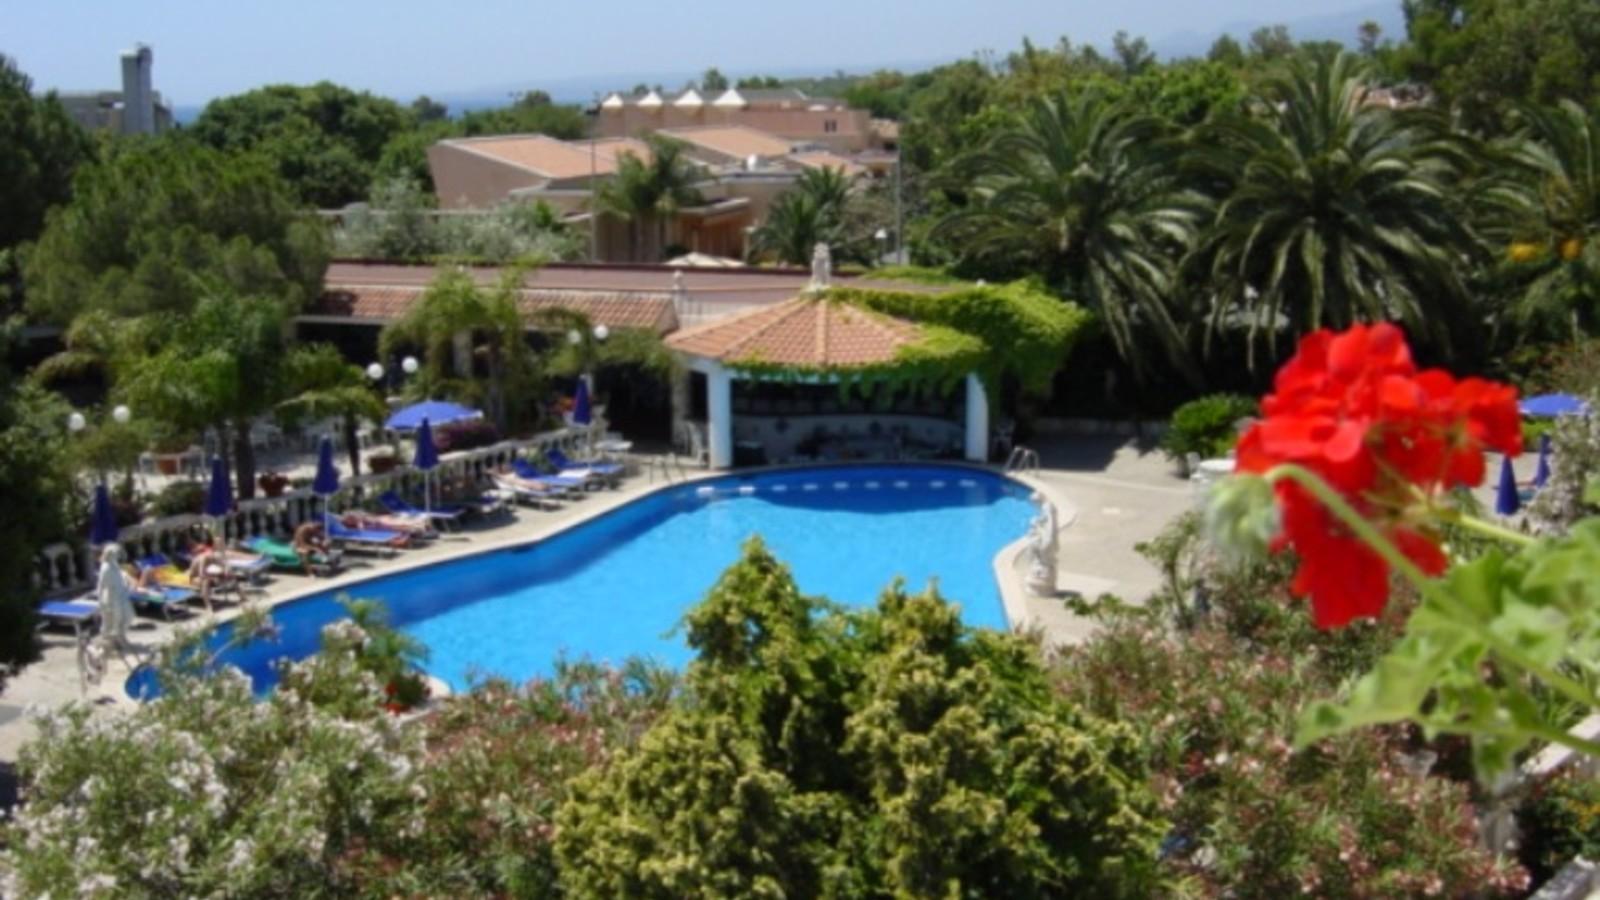 Sant alphio garden h b giardini naxos - Hotel la riva giardini naxos ...